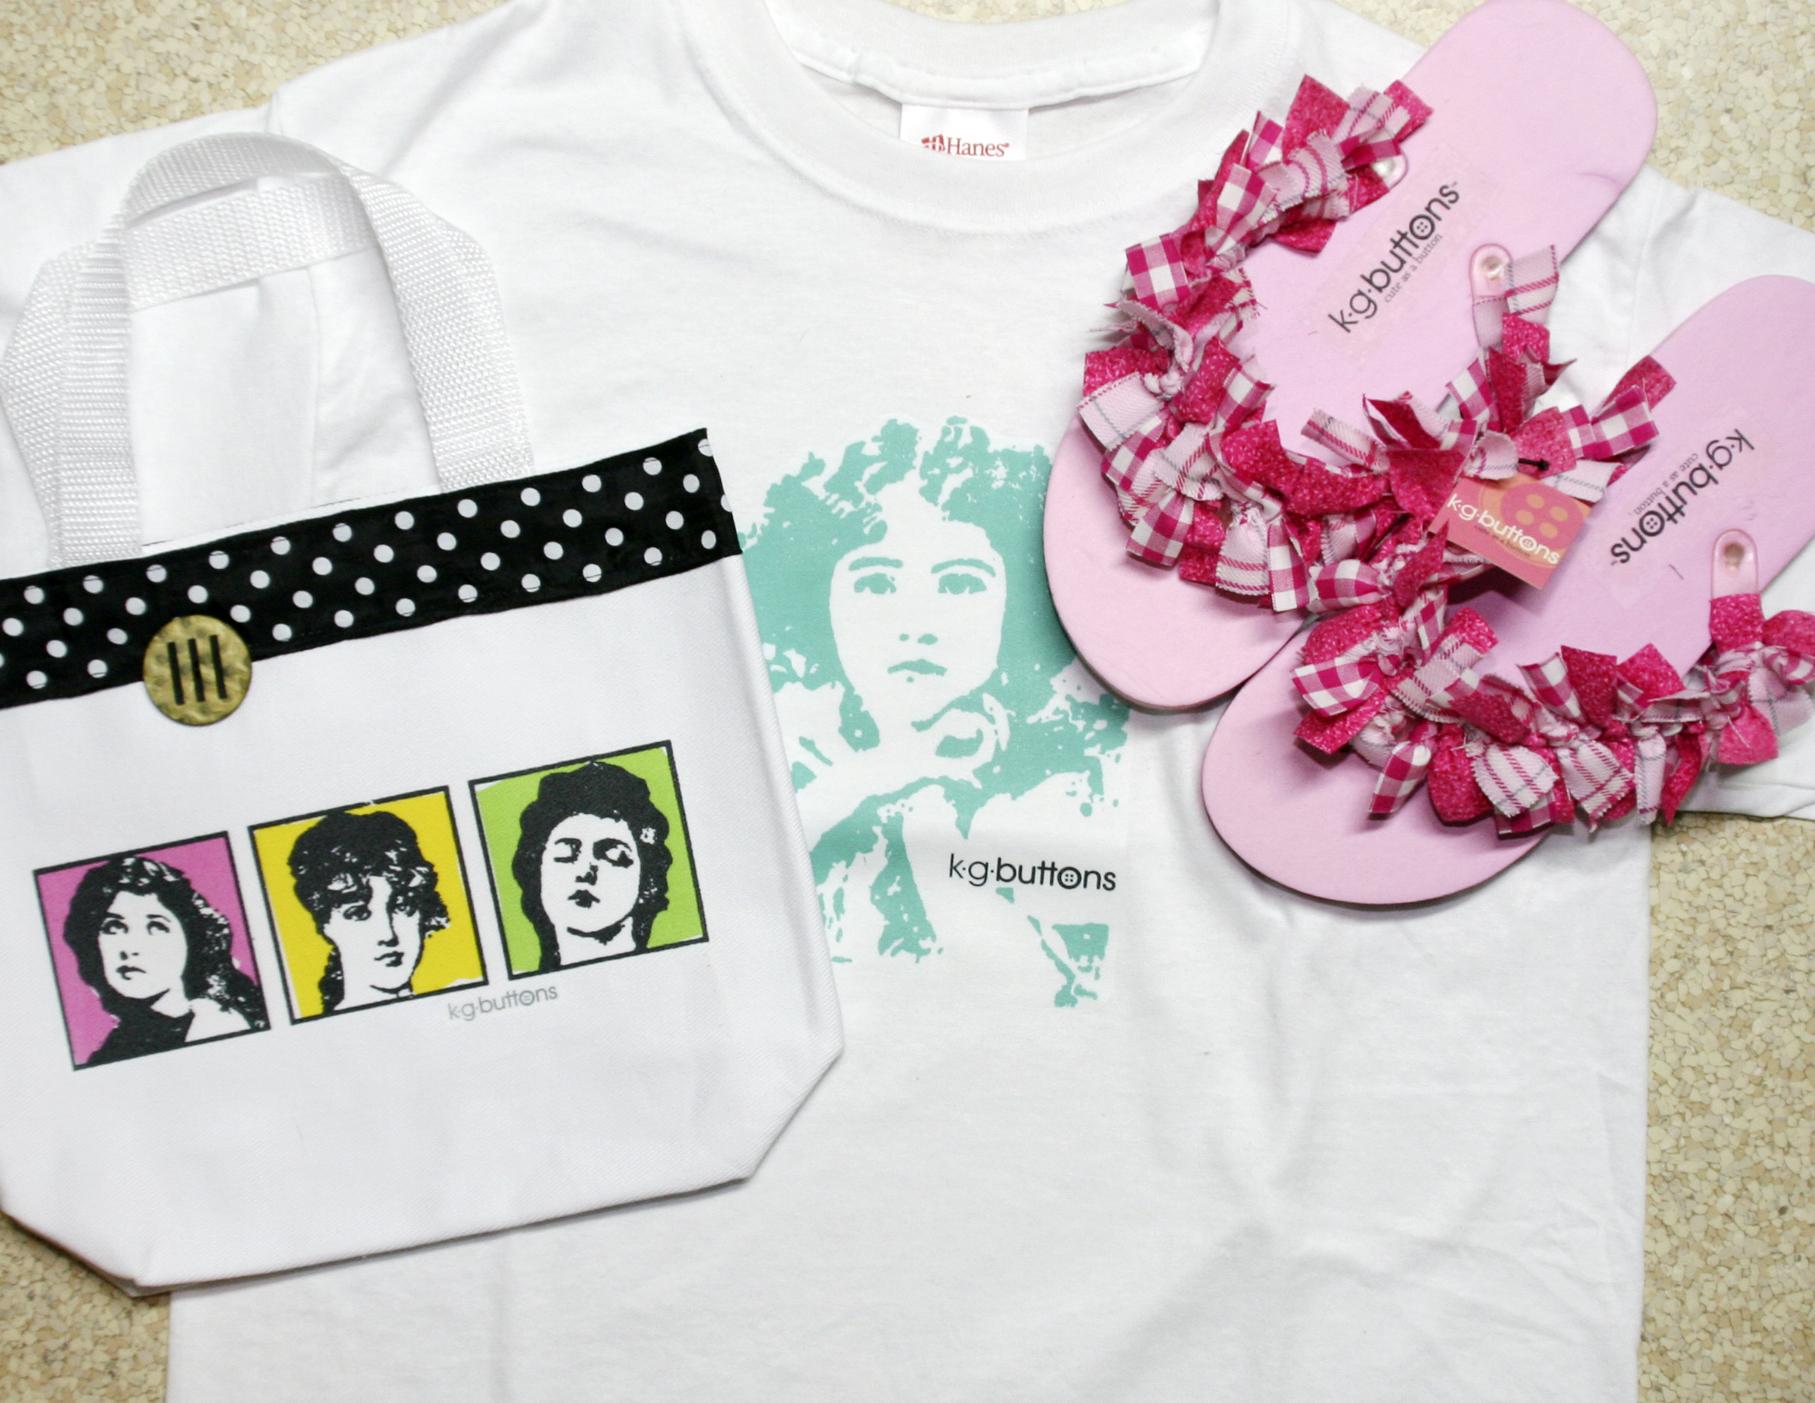 kgbuttons shirt, hand bag, shoe design